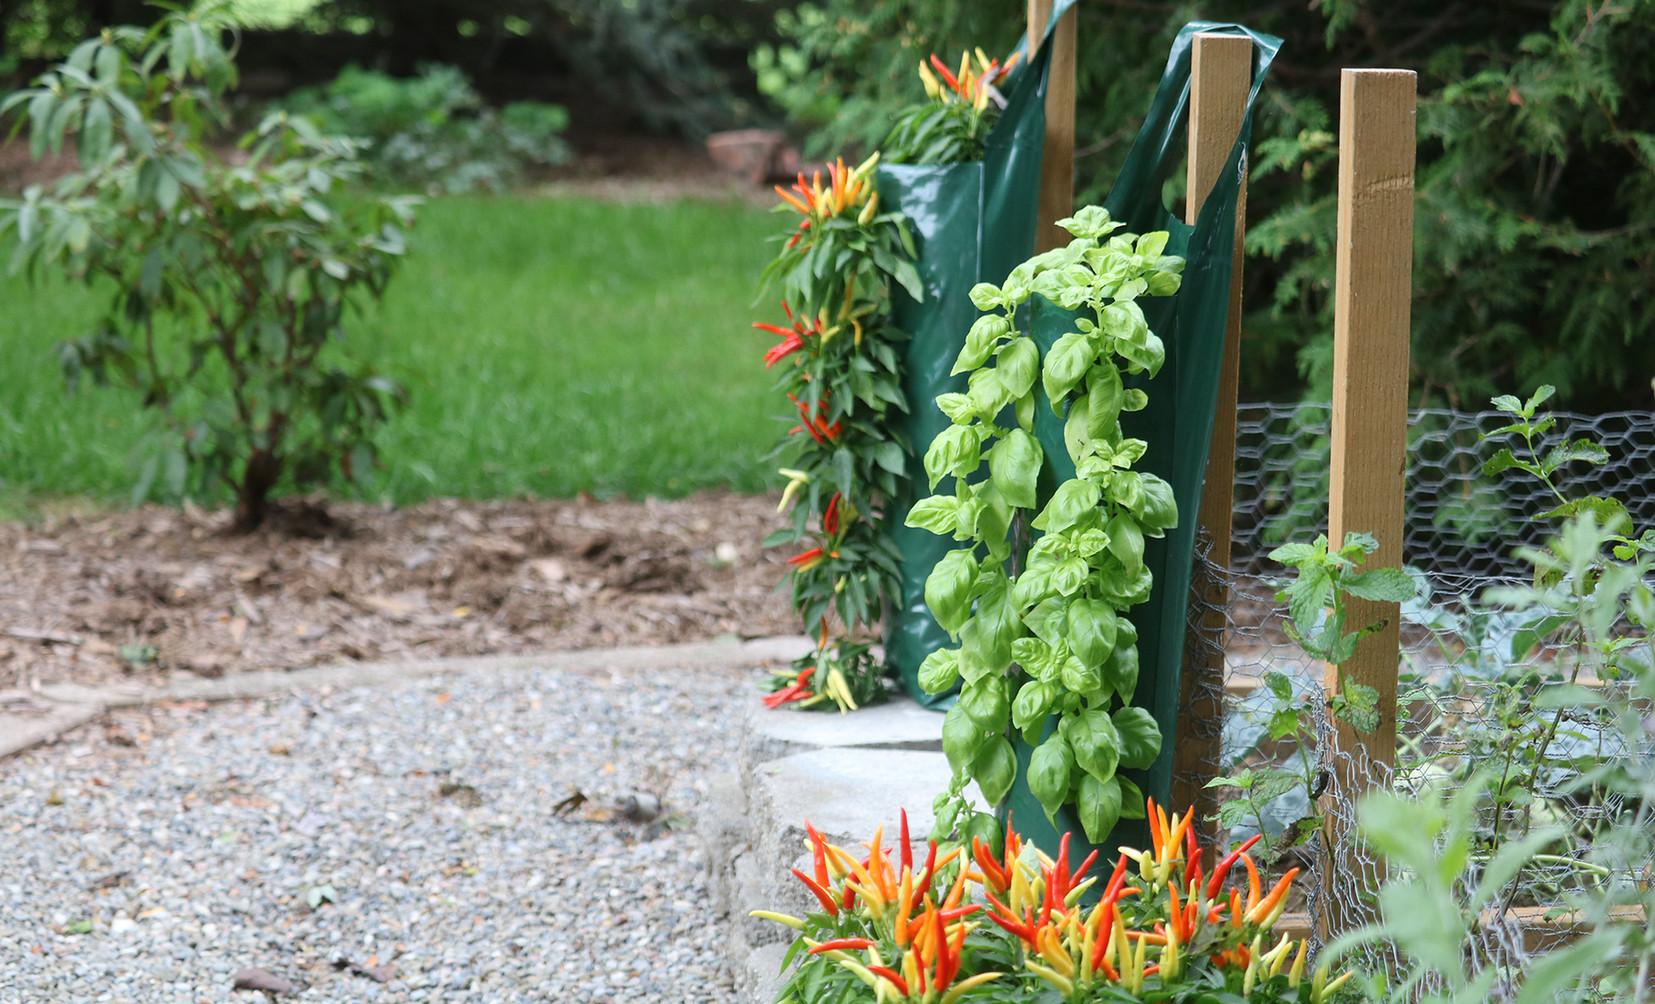 Basil & Decorative Chilies